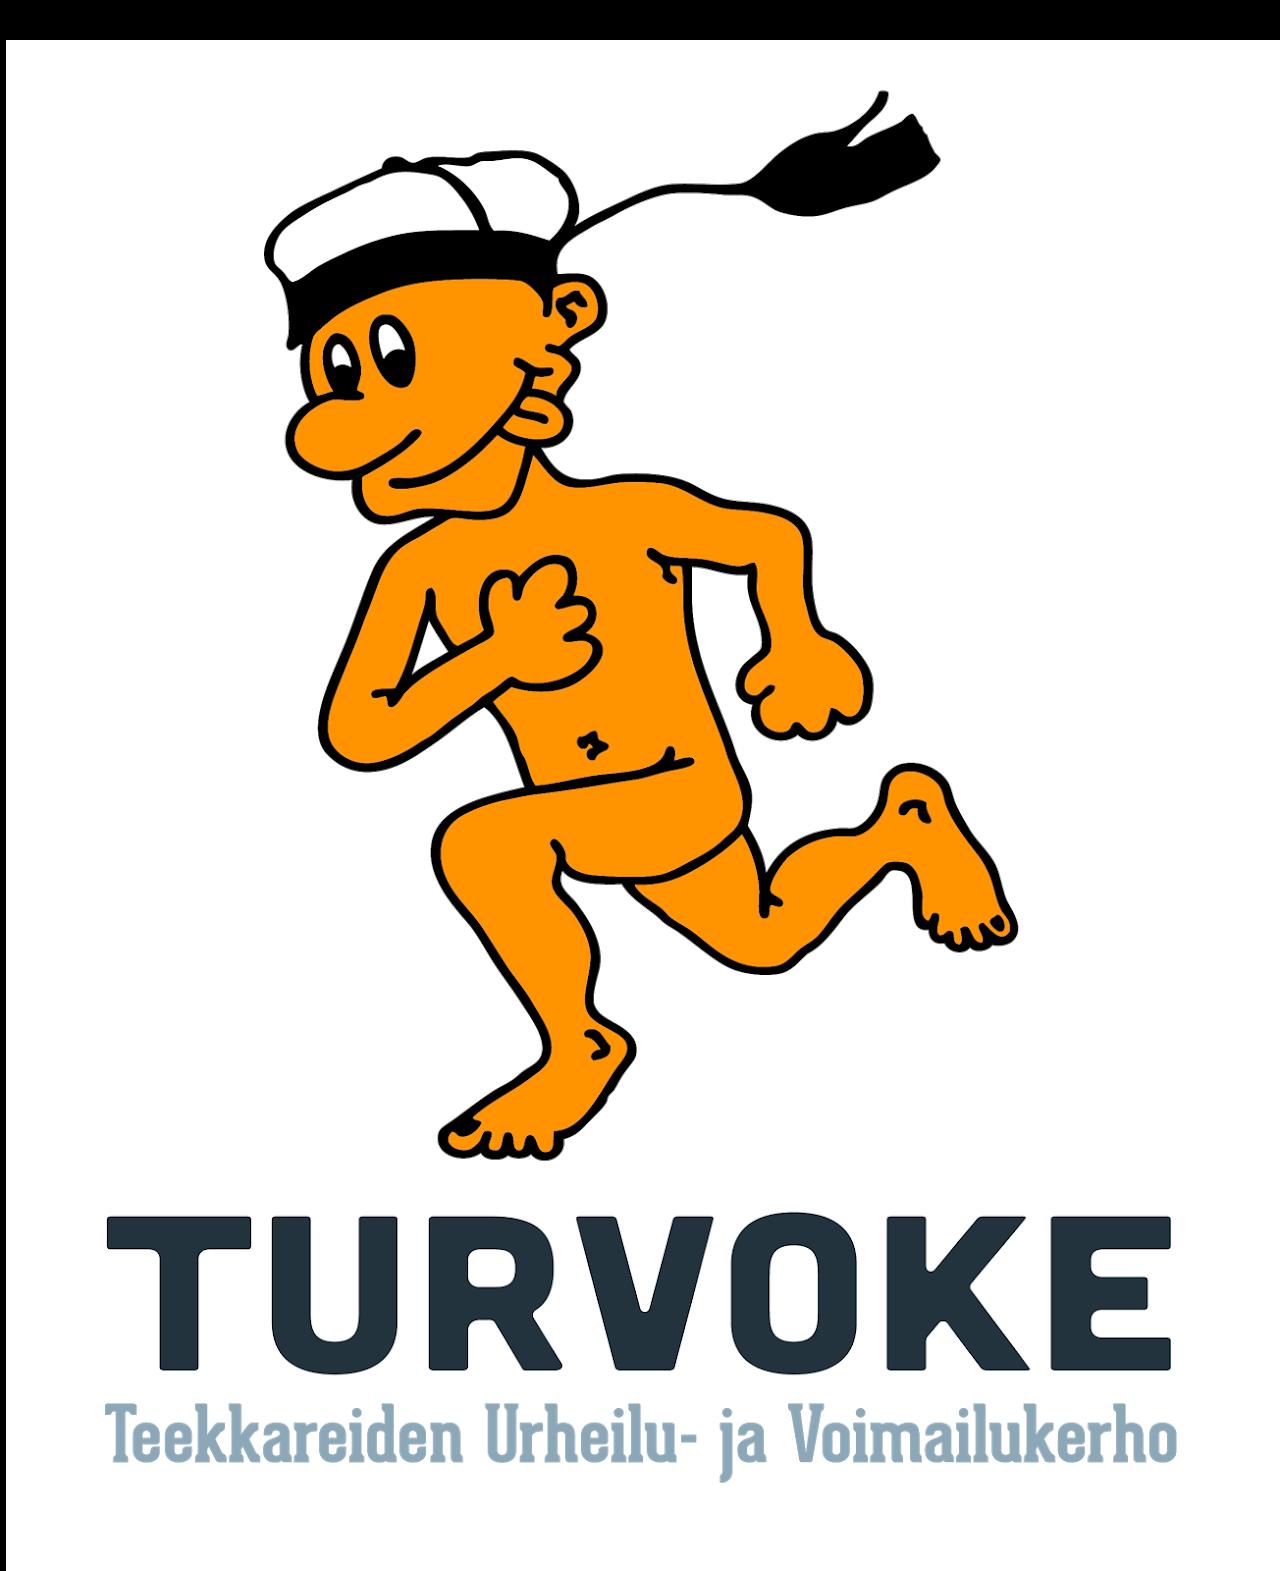 turvoke_logo